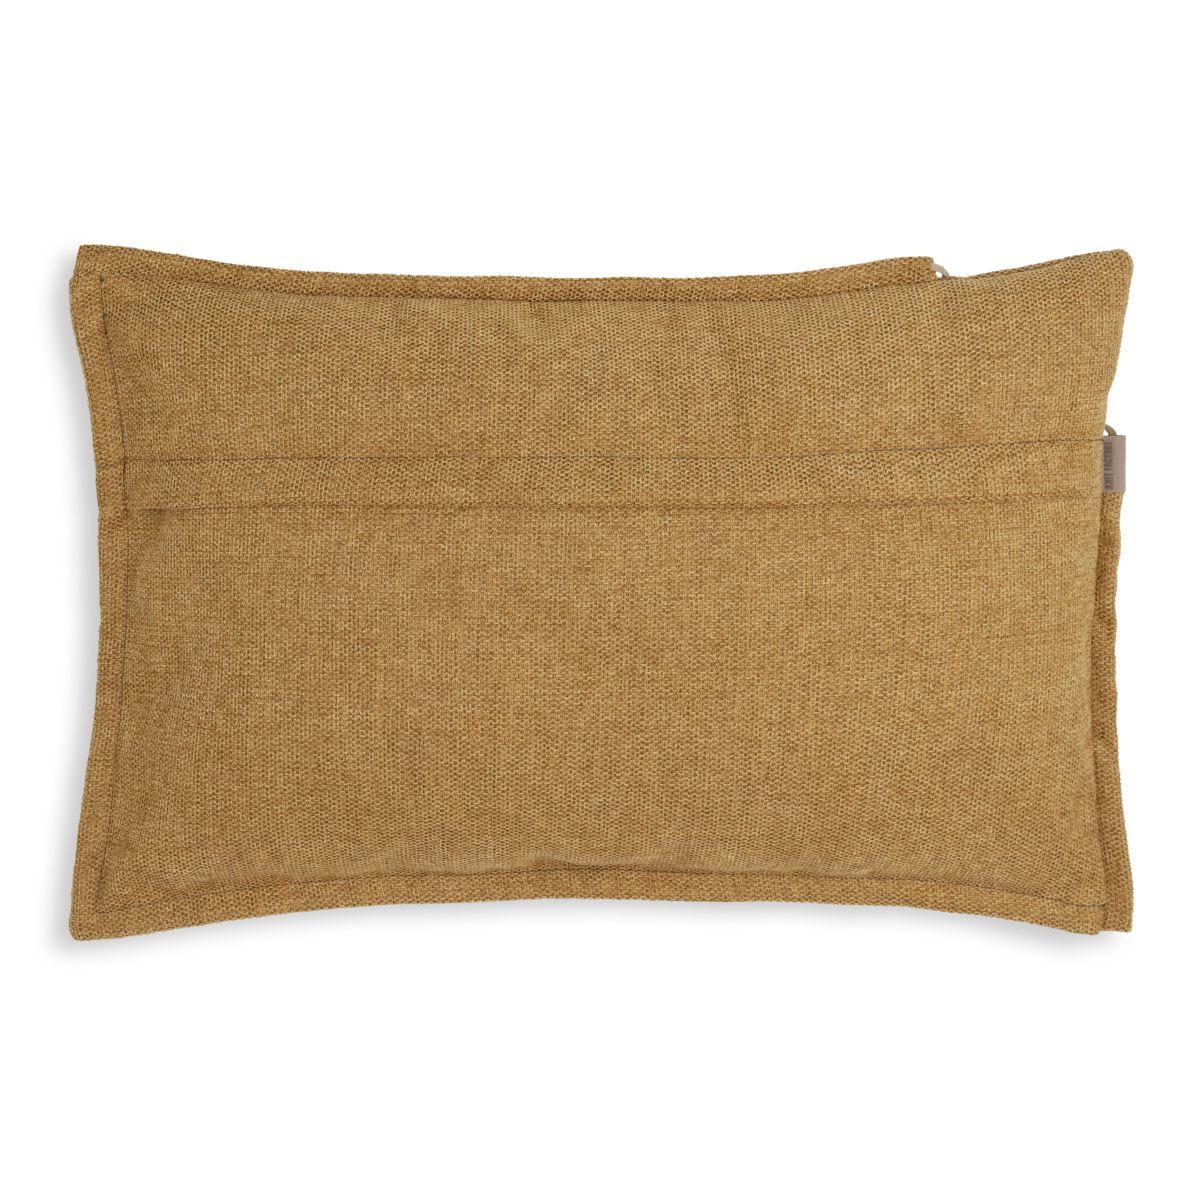 imre cushion ochre 60x40